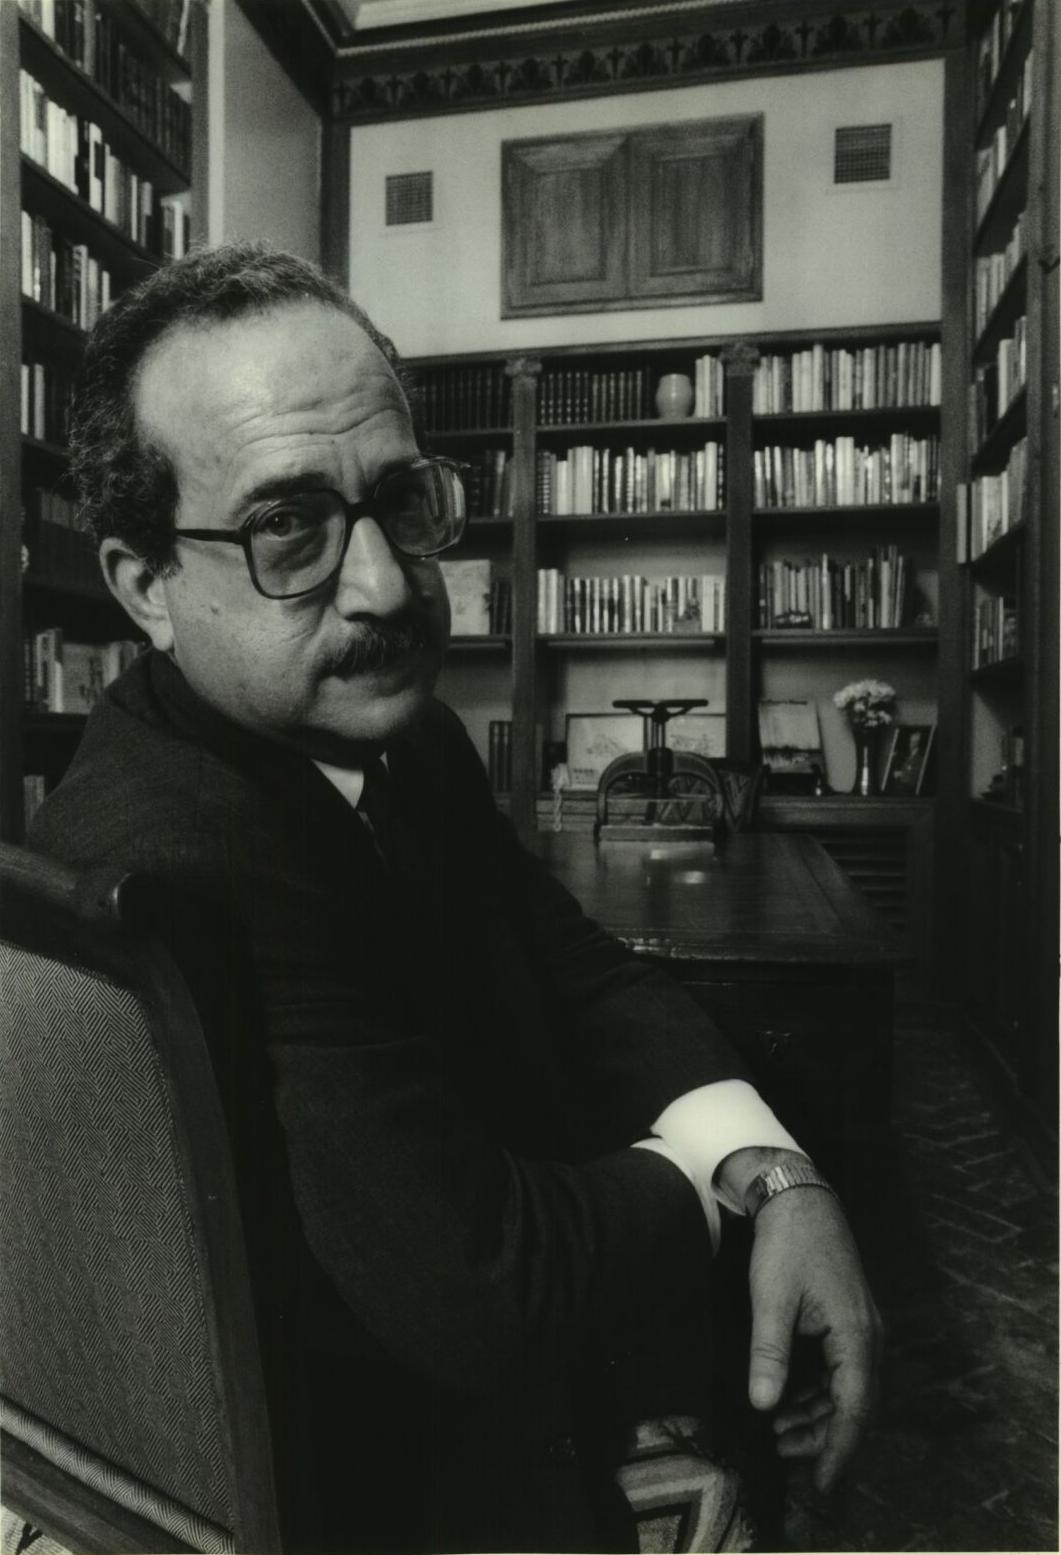 Joseph DeSalvo